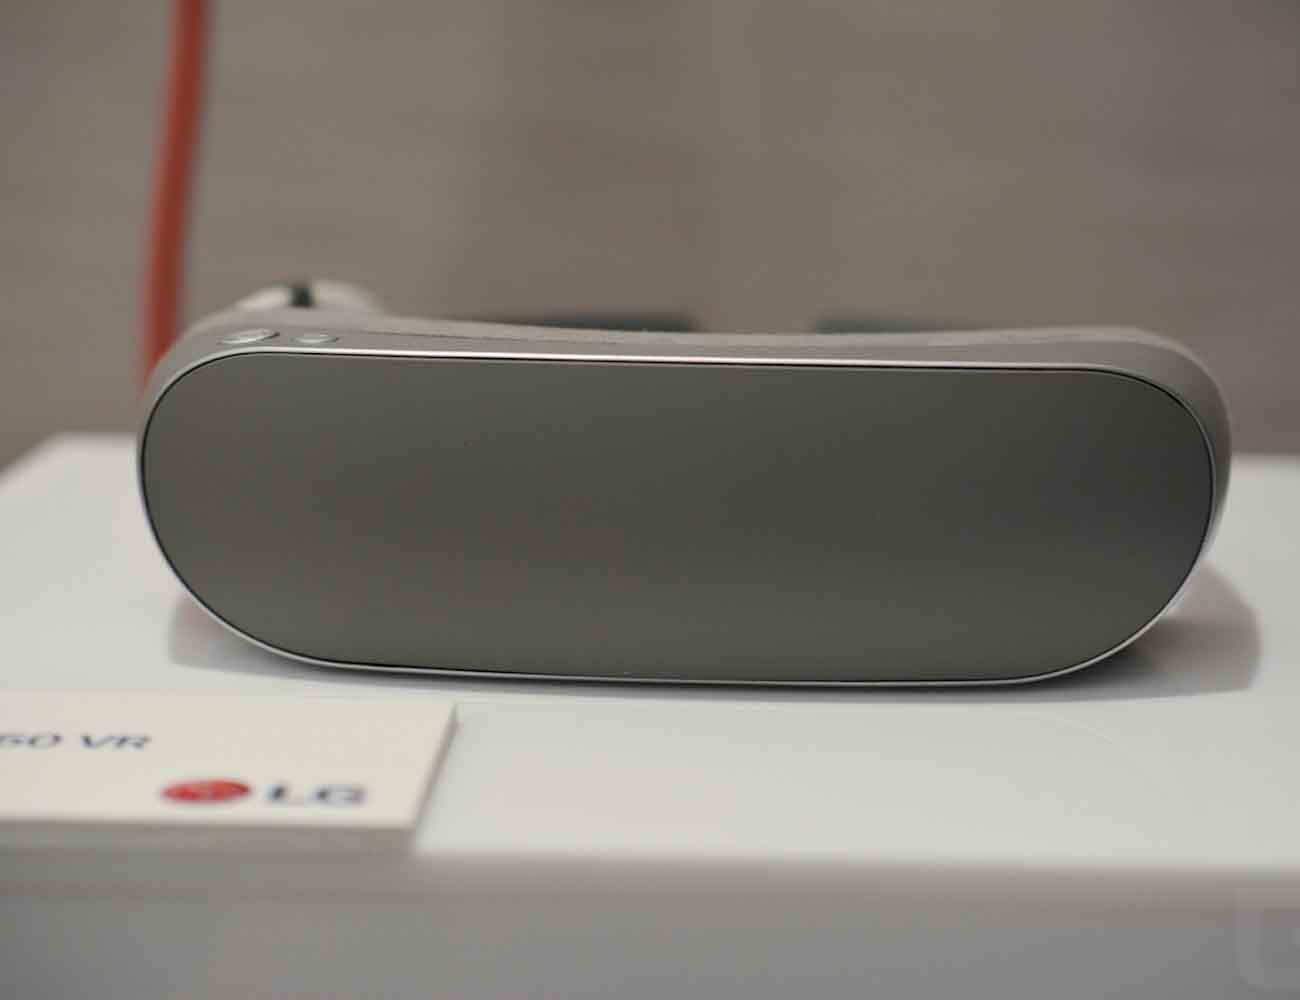 LG 360 VR – Mobile Virtual Reality Just Like Reading Glasses